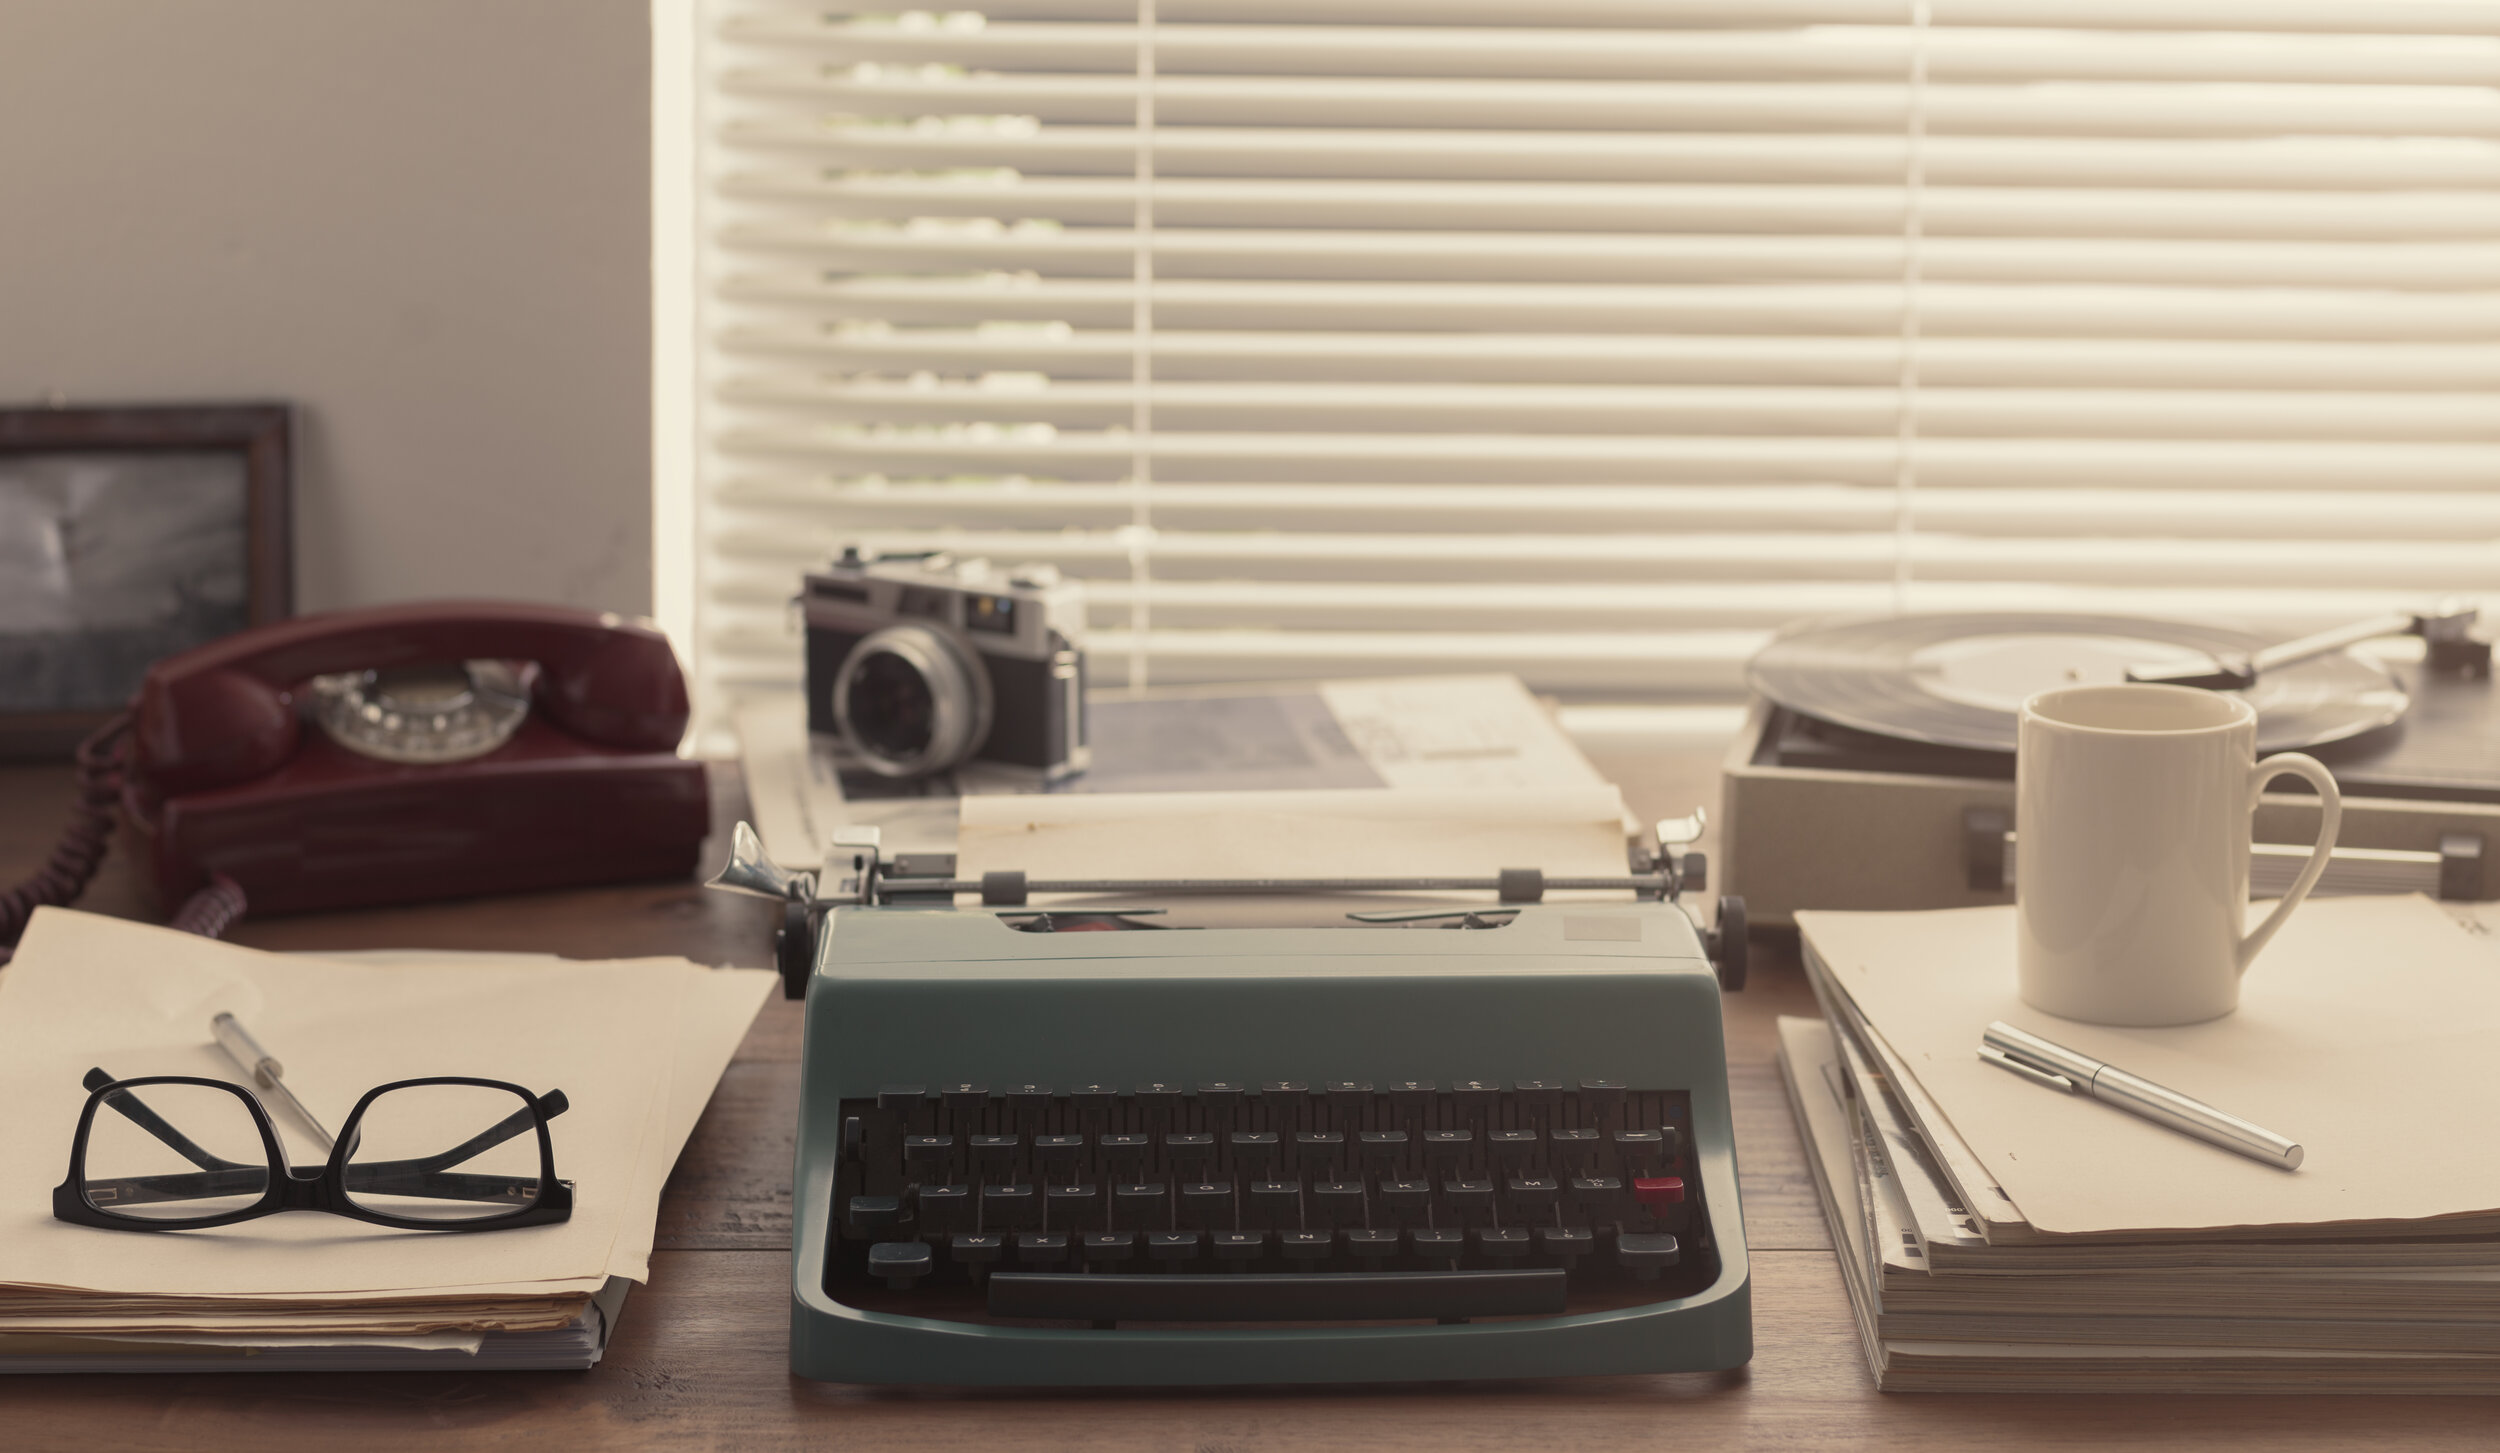 Canva - Writer and journalist vintage desktop with typewriter.jpg